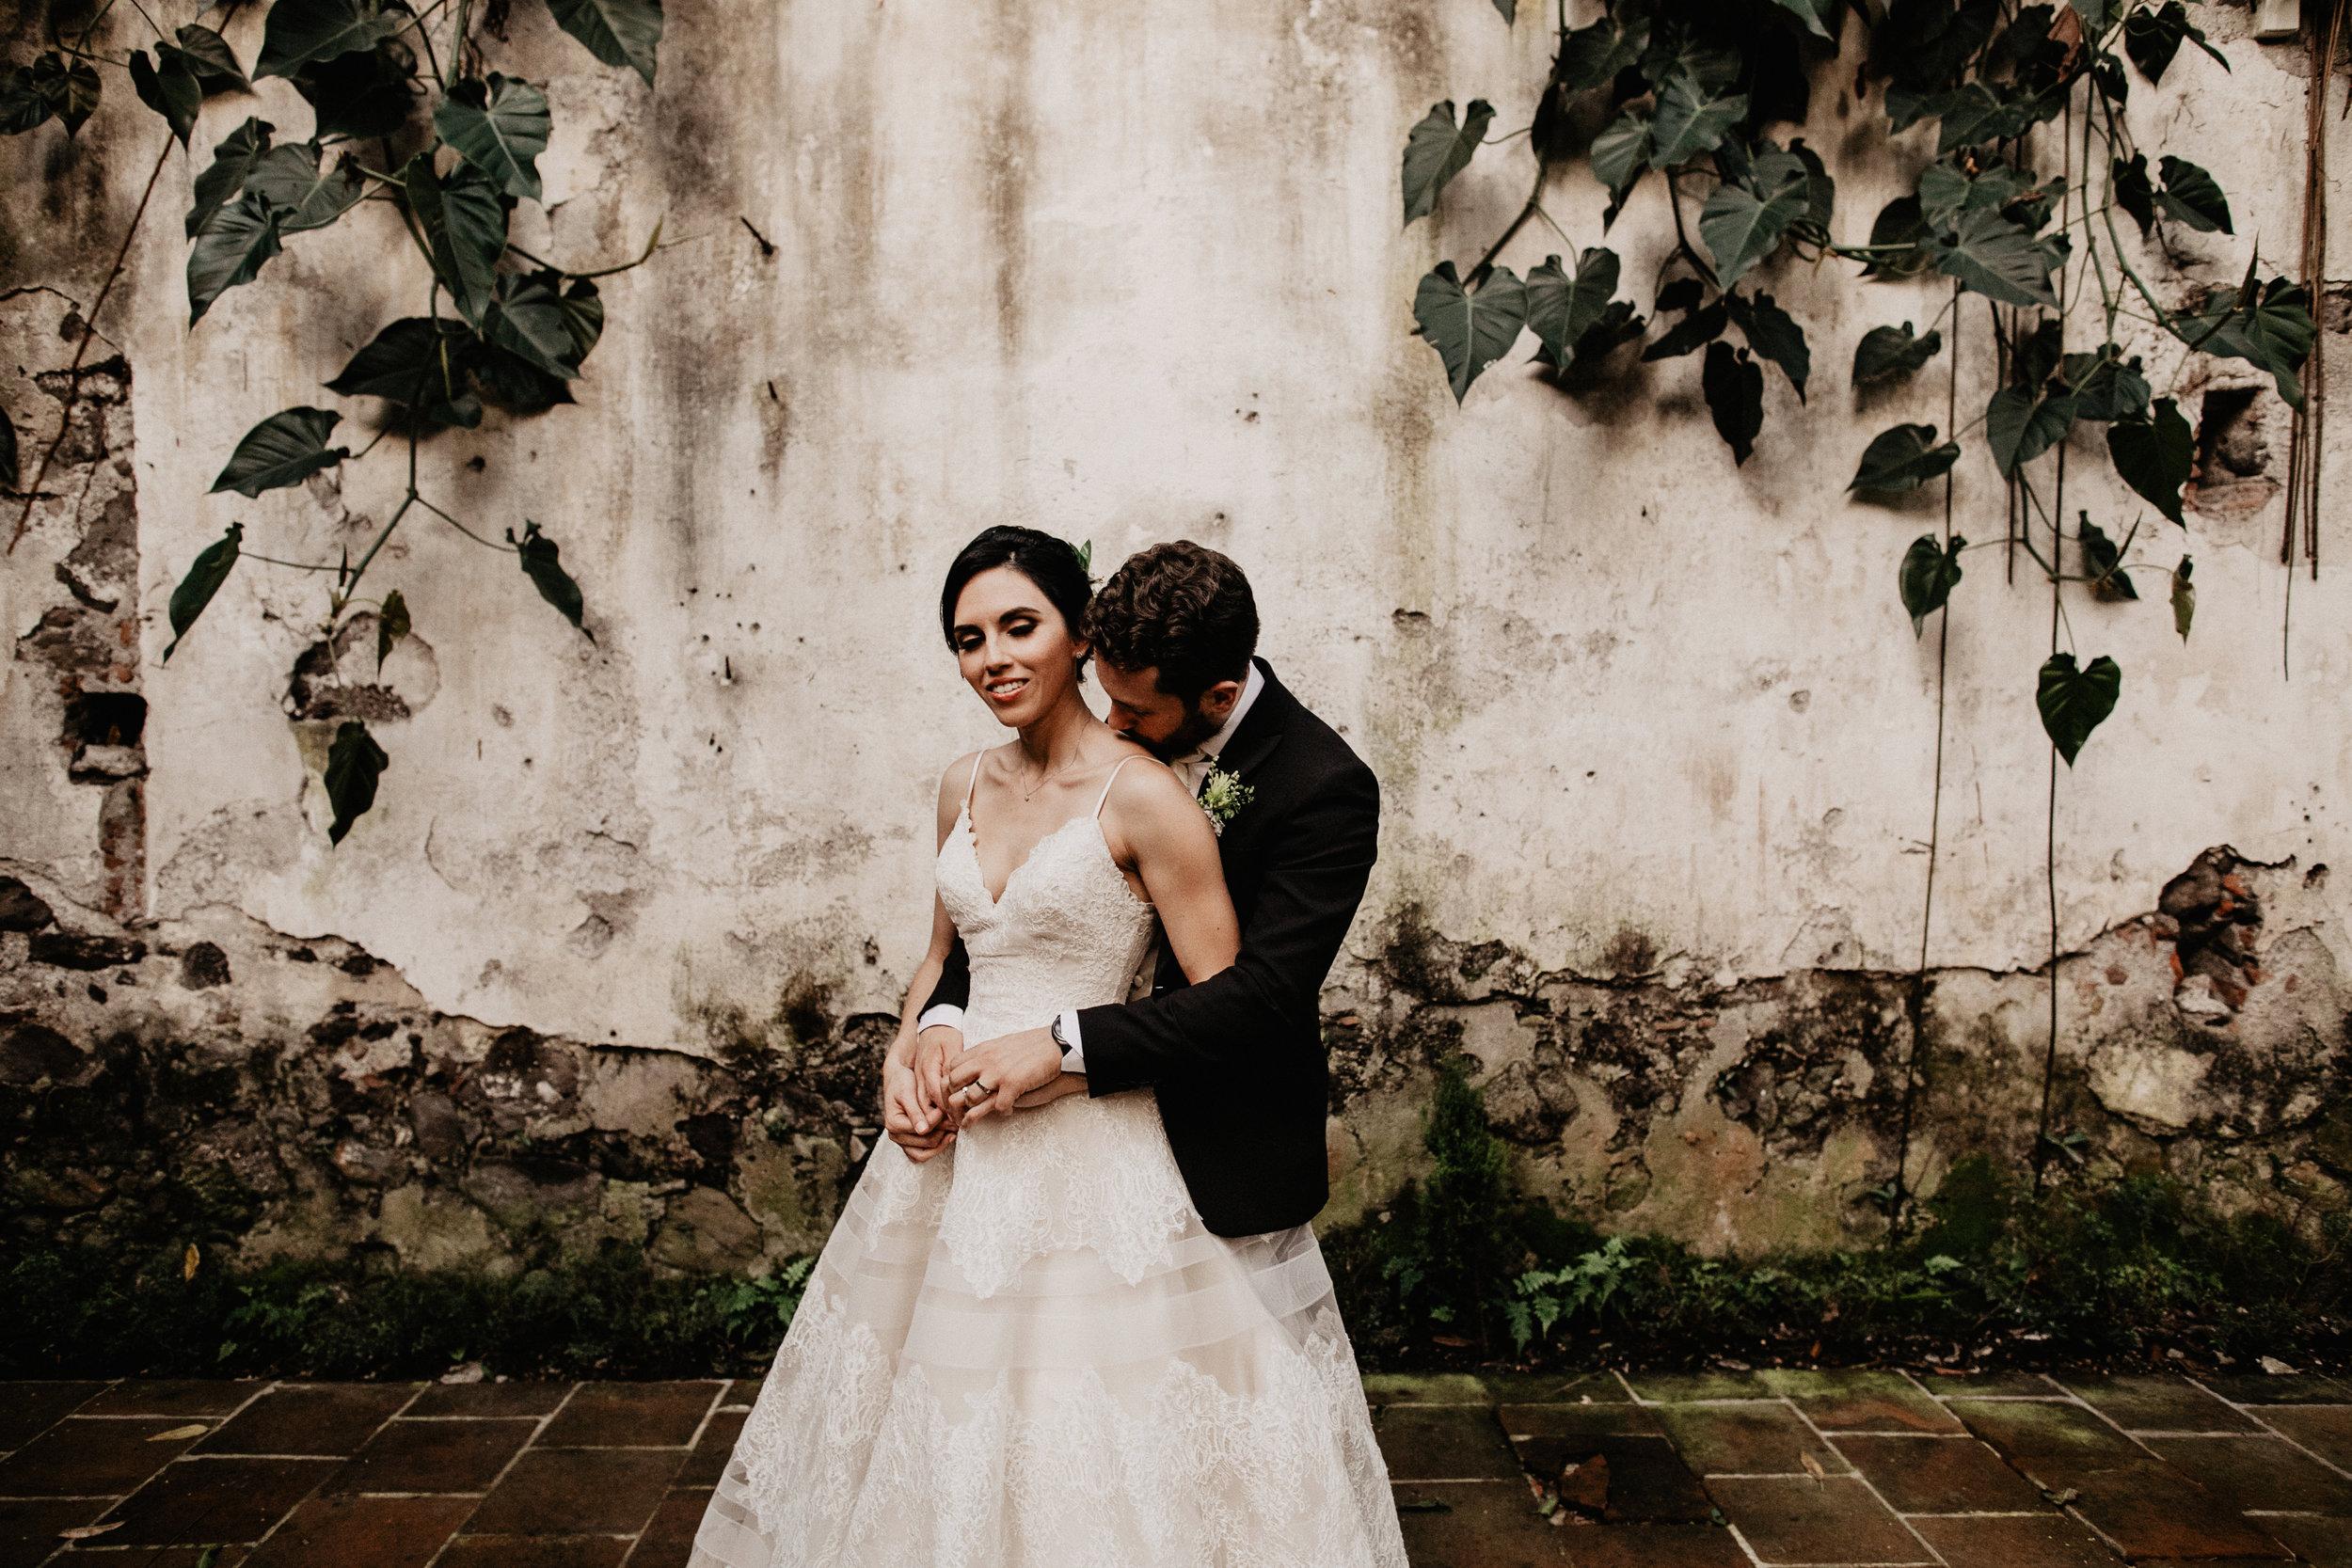 Alfonso_flores_destination_wedding_photography_vanesa_carlos-874.JPG